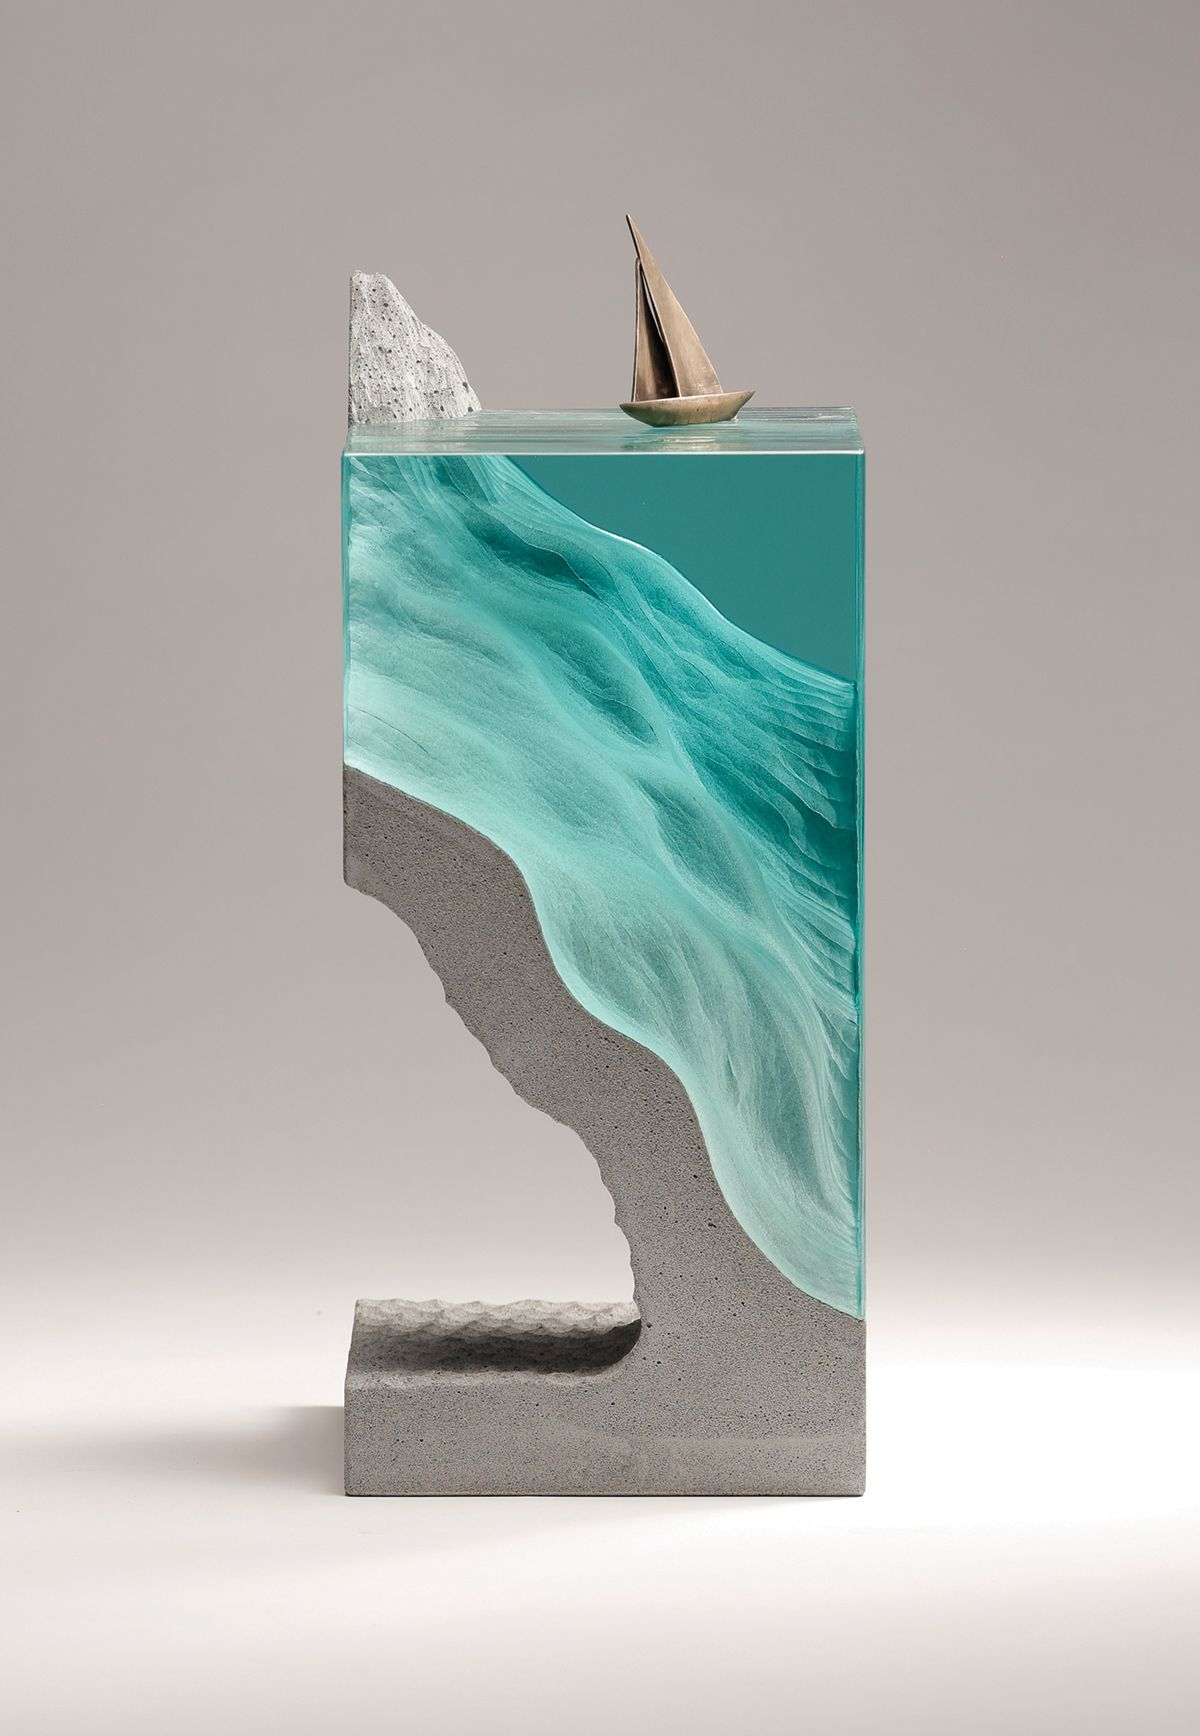 Set sail laminated float glass cast concrete and bronze for Cement art design